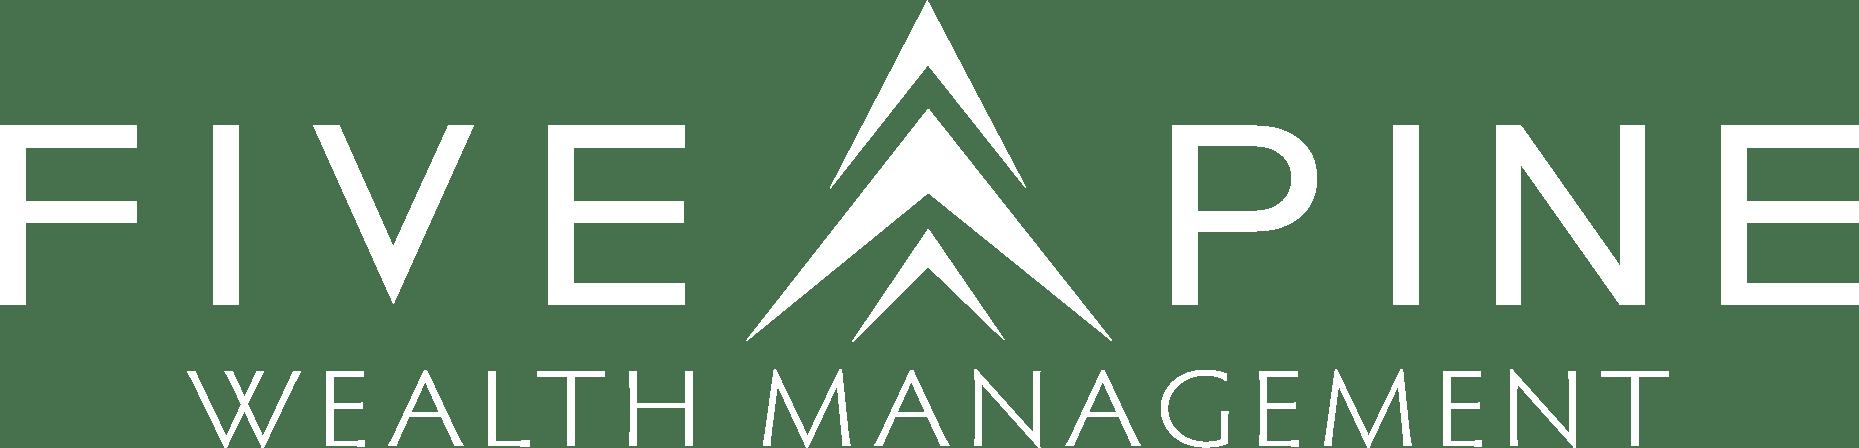 Five Pine Wealth Management